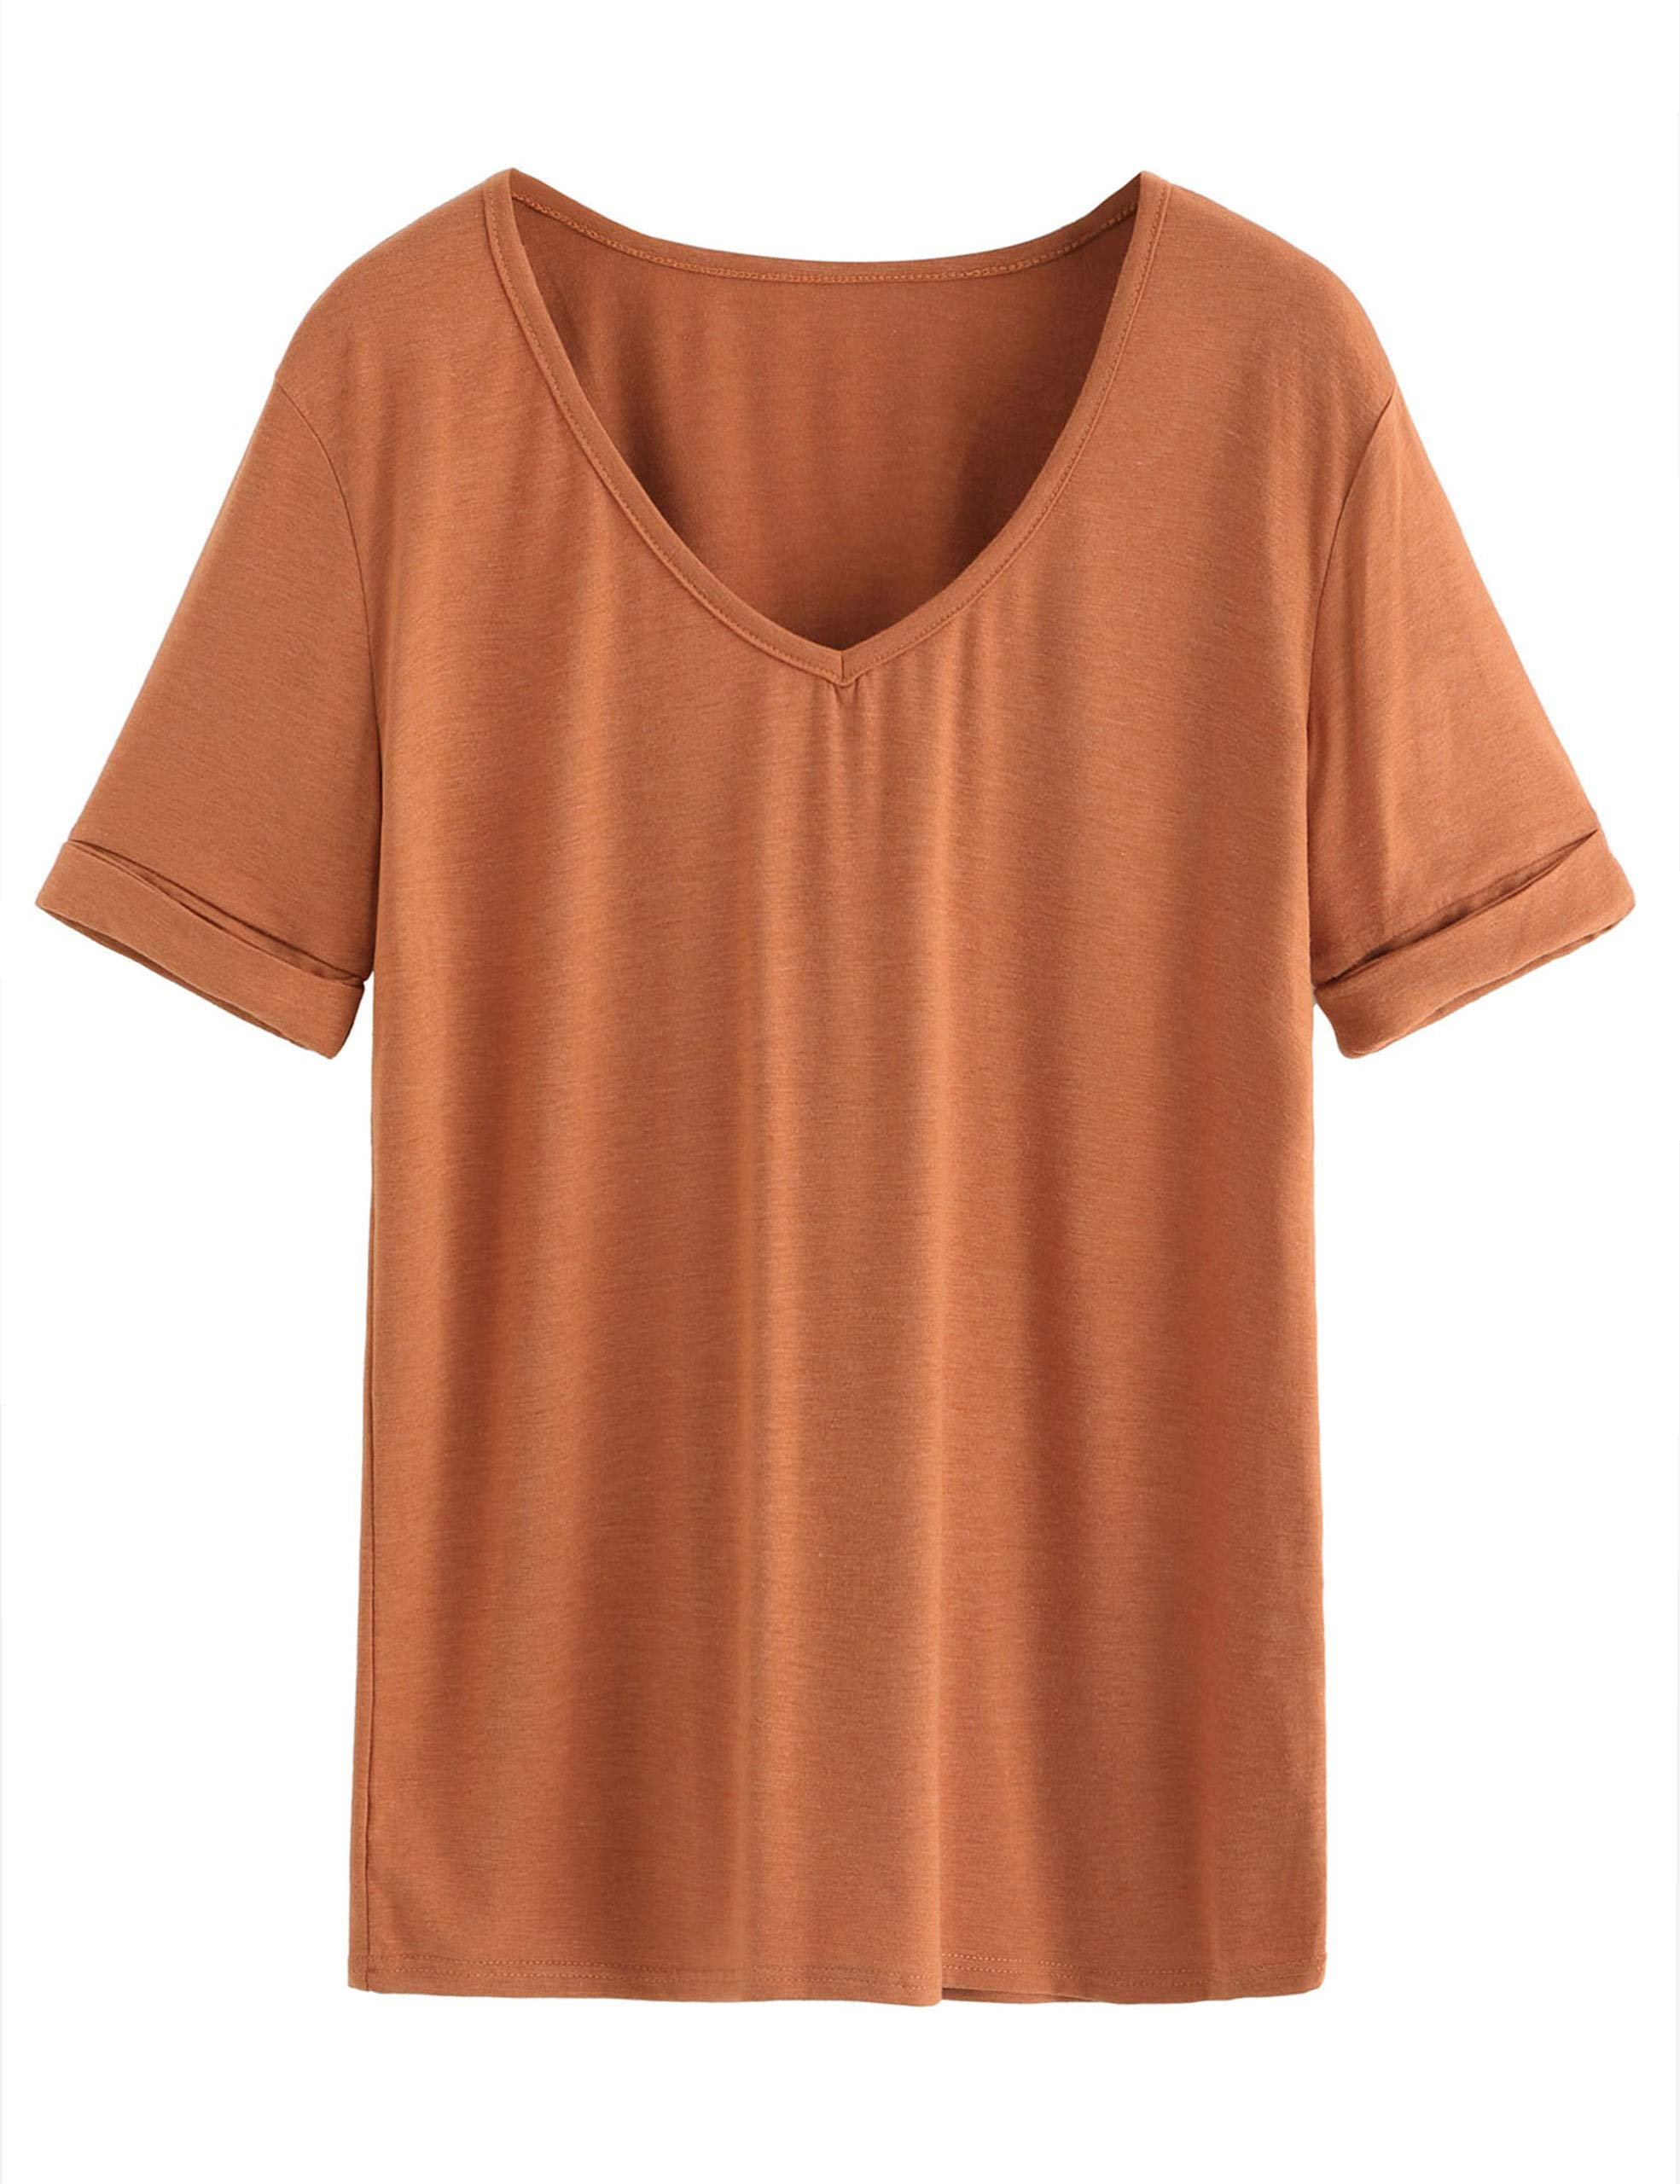 SheIn Women's Summer Short Sleeve Loose Casual Tee T-Shirt Brown Small